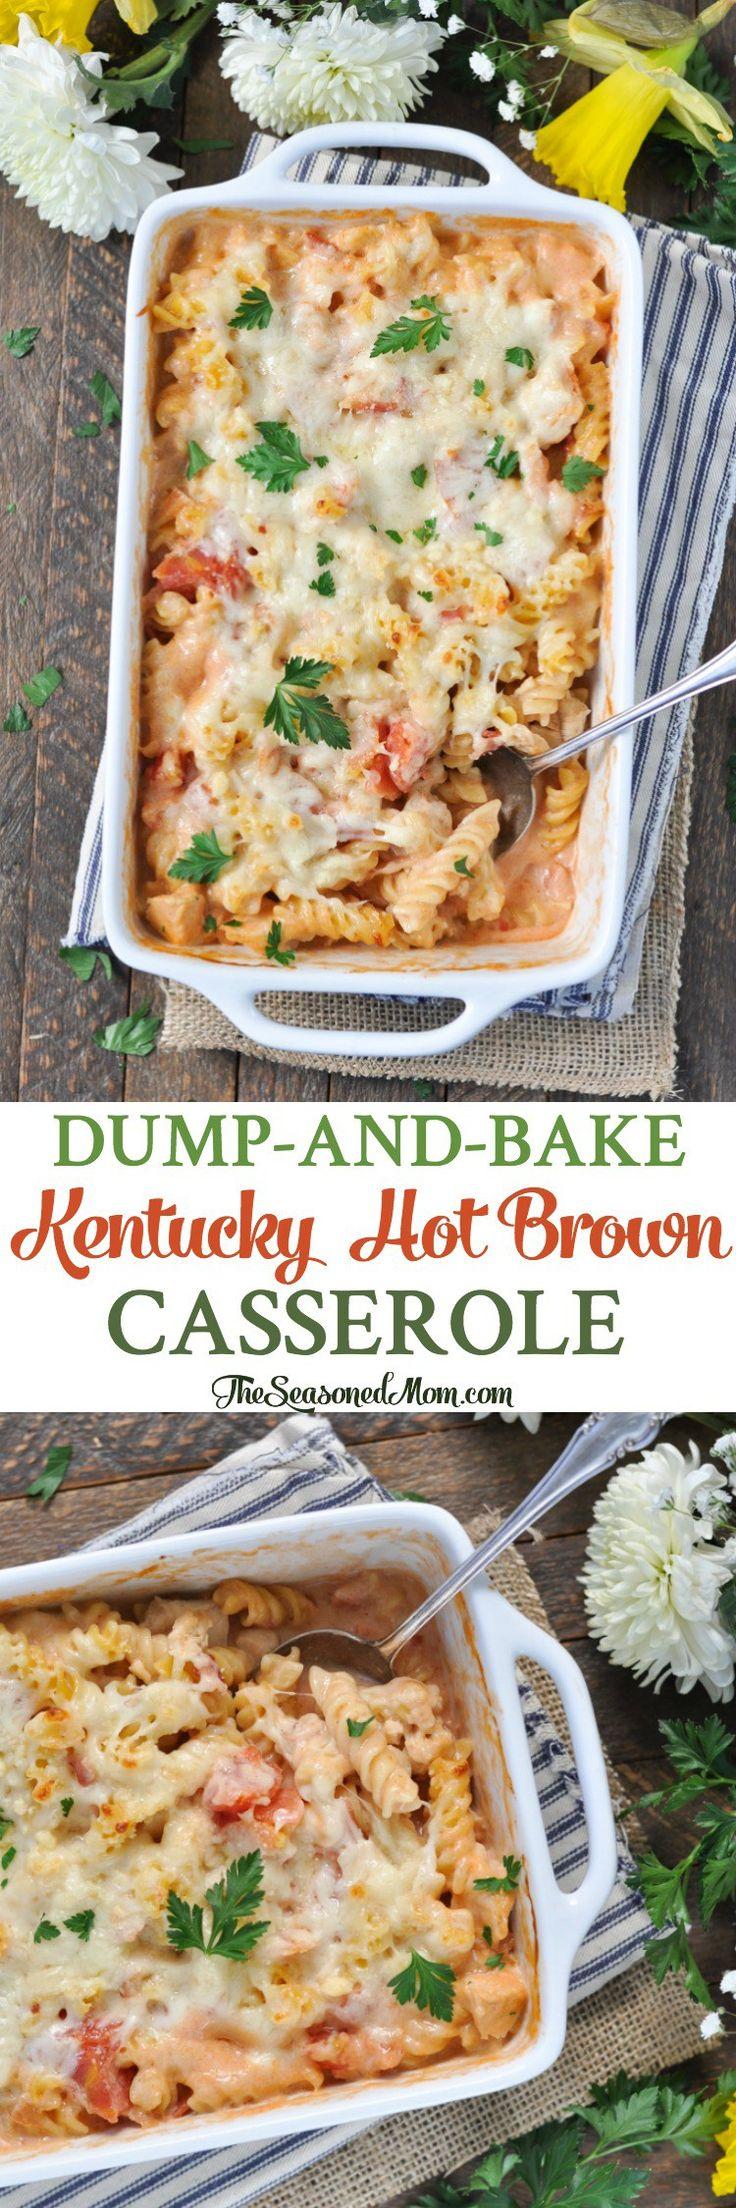 Dump-and-Bake Kentucky Hot Brown Casserole! Derby Party | Easy Dinner Recipes | Dinner Ideas | Pasta Recipes | Chicken Recipes | Turkey Recipes | Casserole Recipes